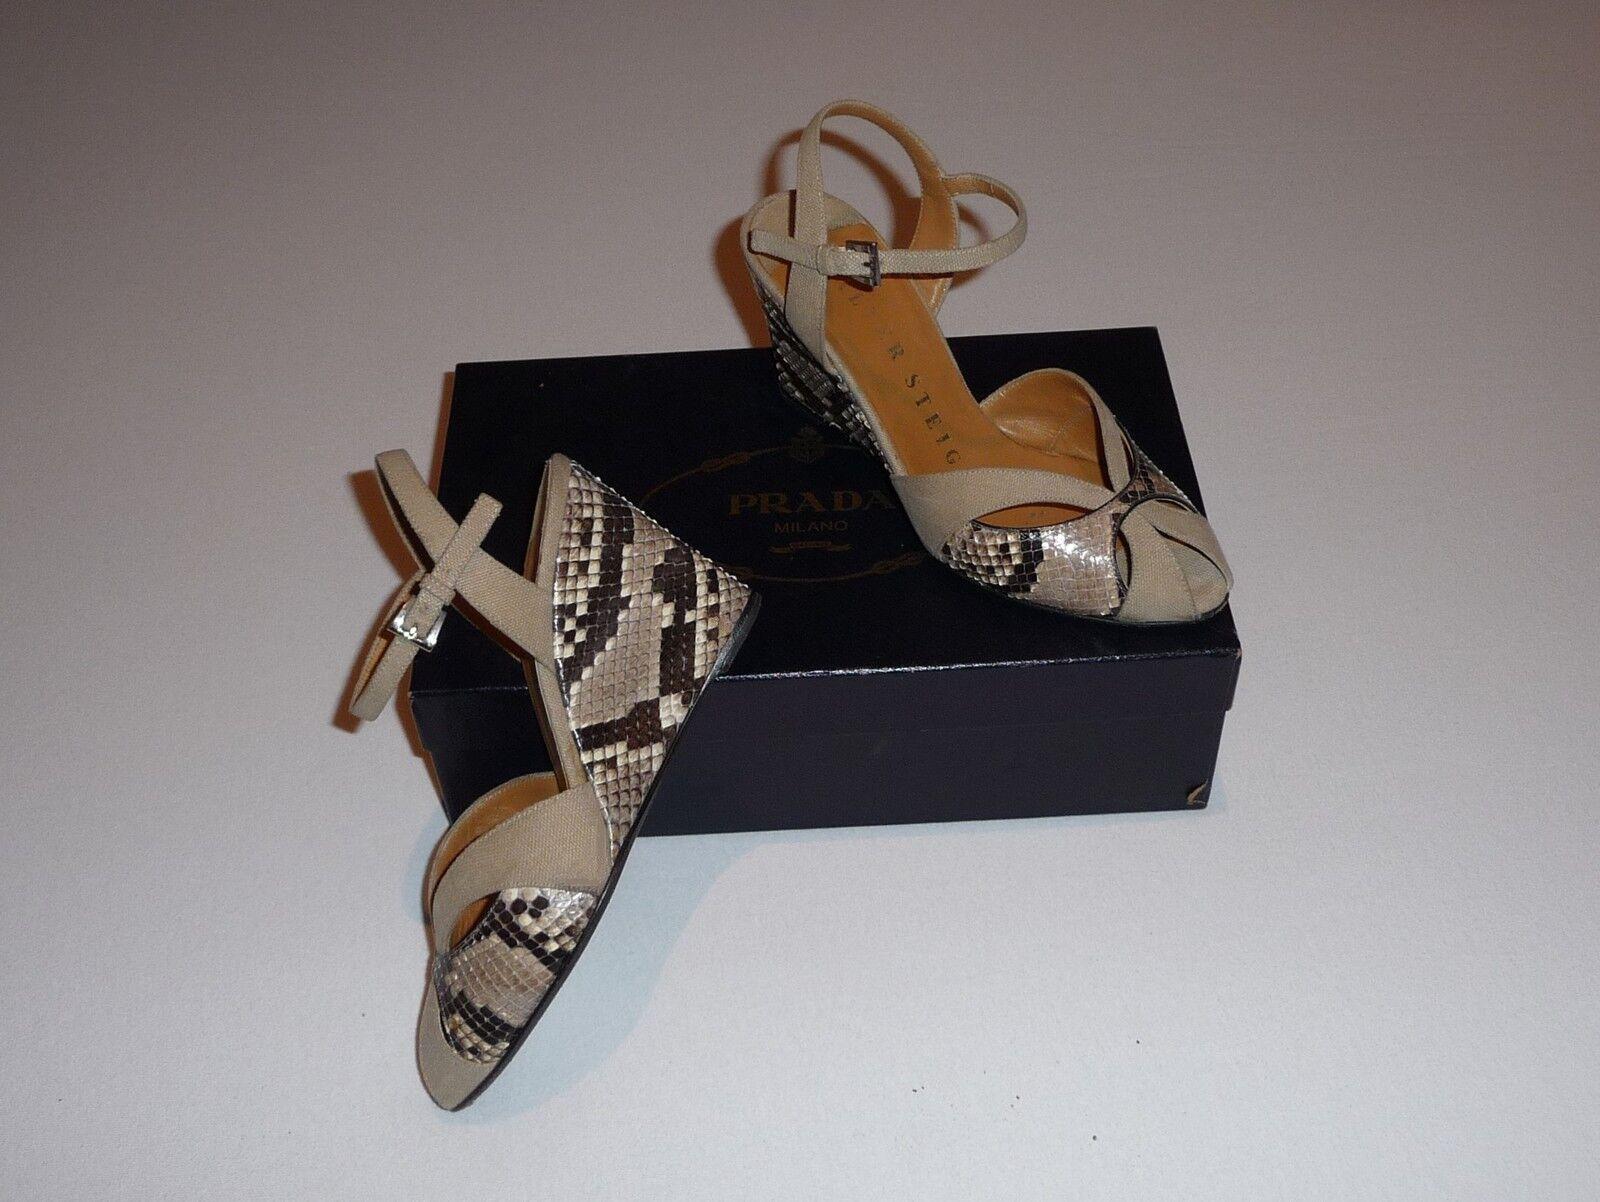 Luxury, the spoiled Walter Steiger Fabulous shoes size 35 NP529, & Prada Box NEUW